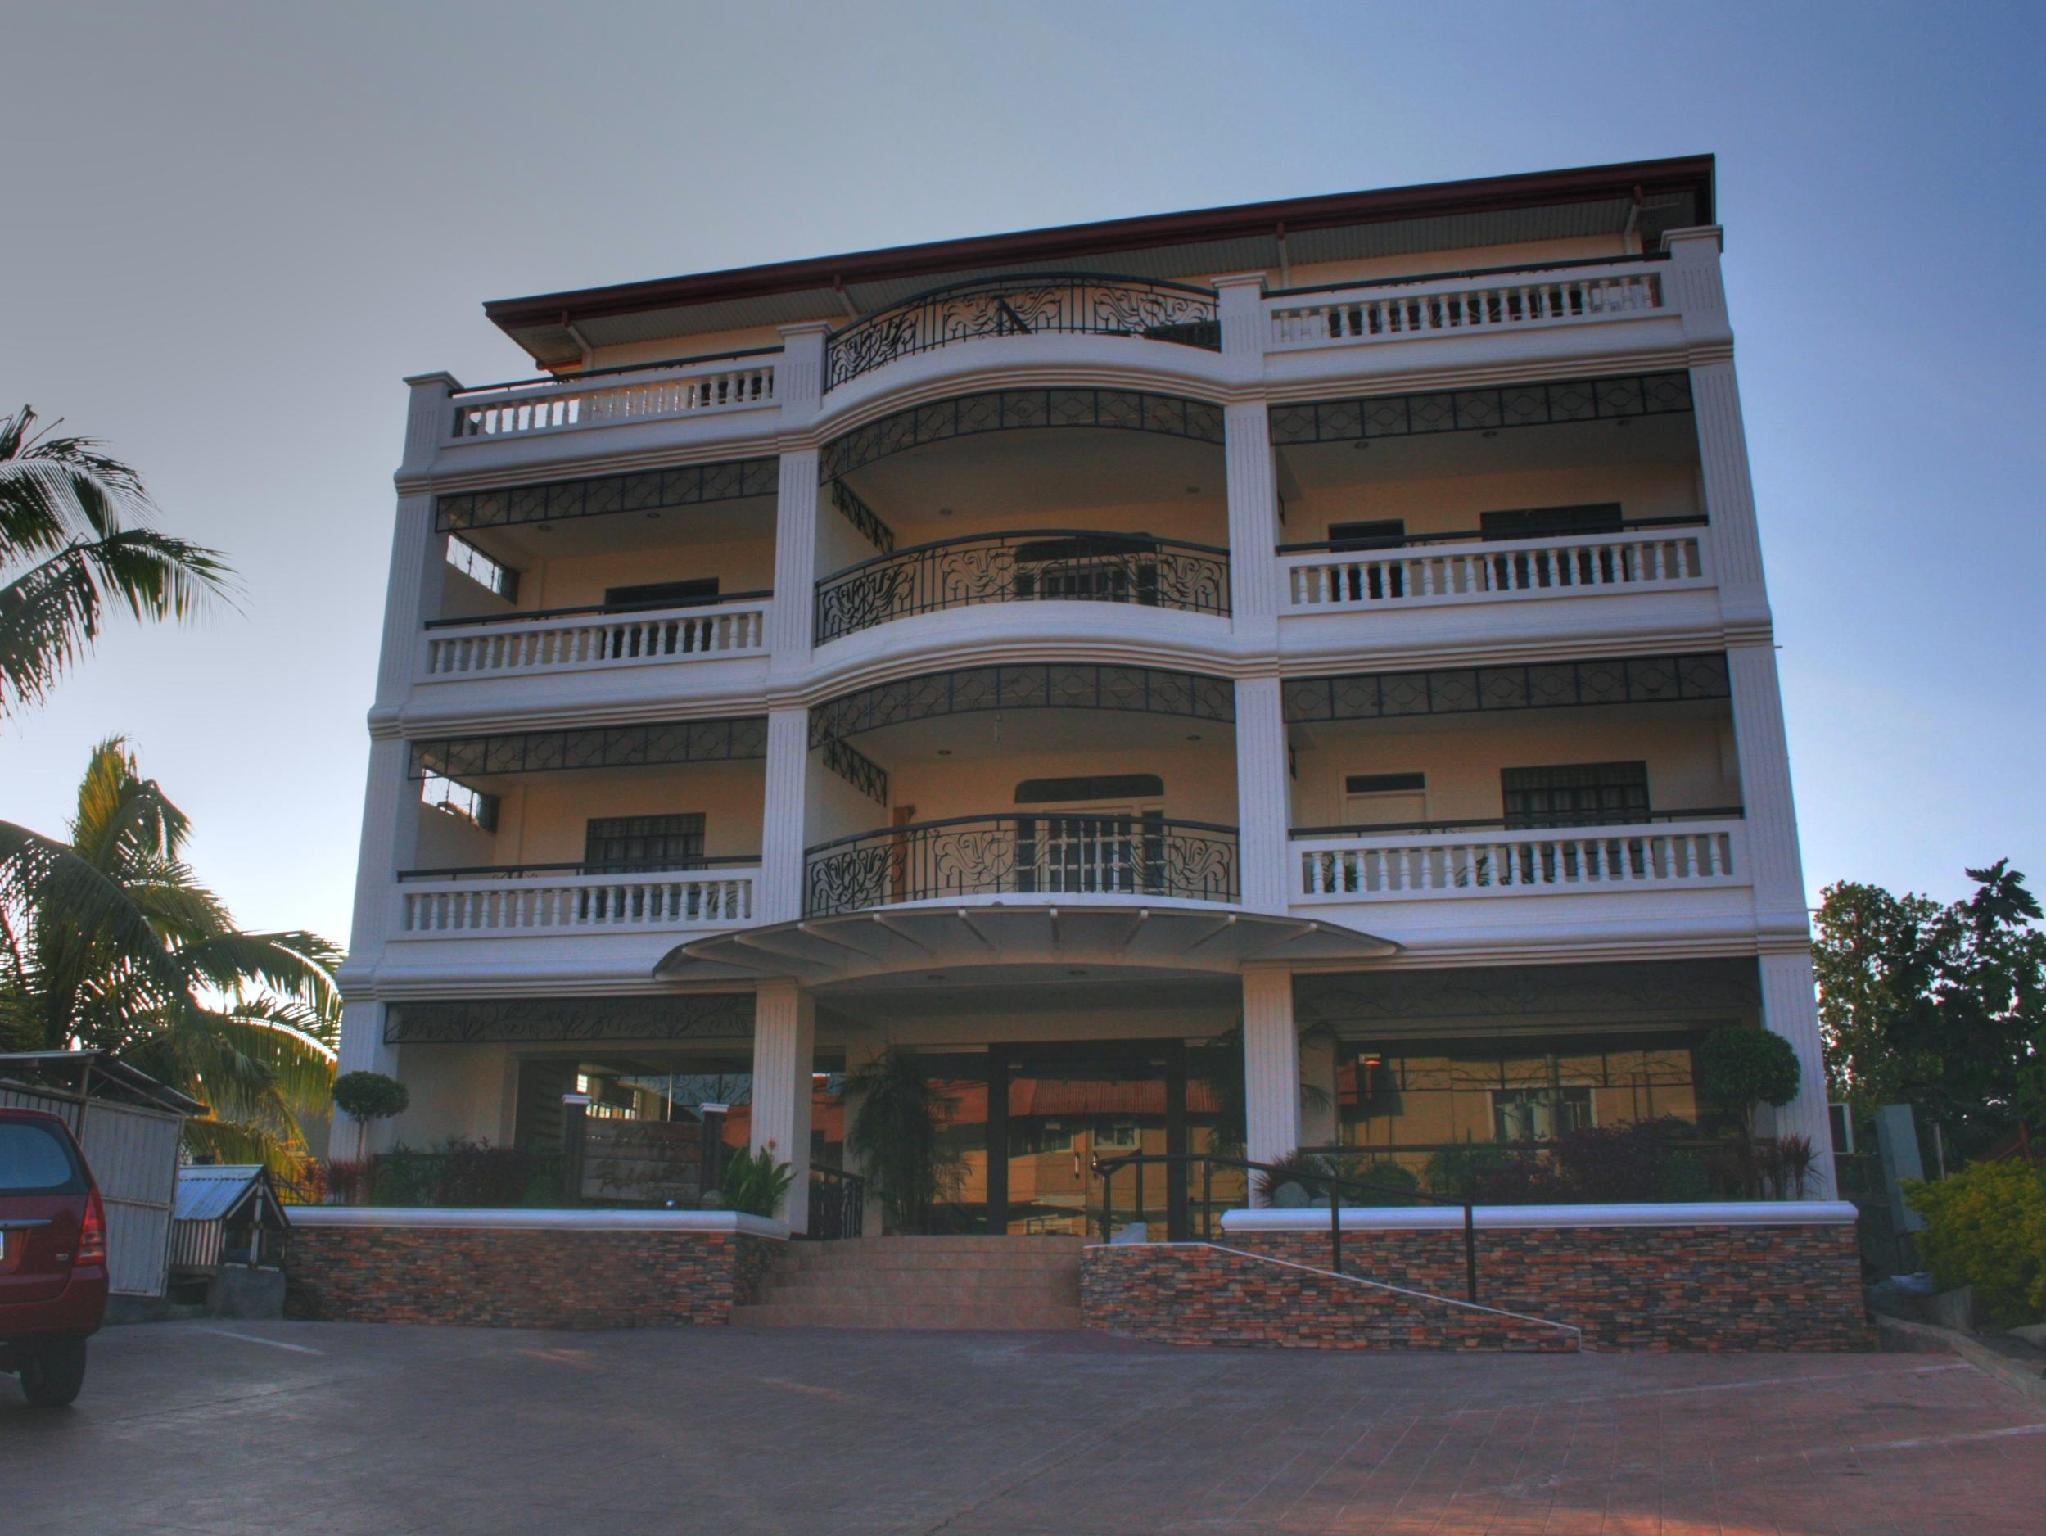 Mira de Polaris Hotel Λαοαγκ